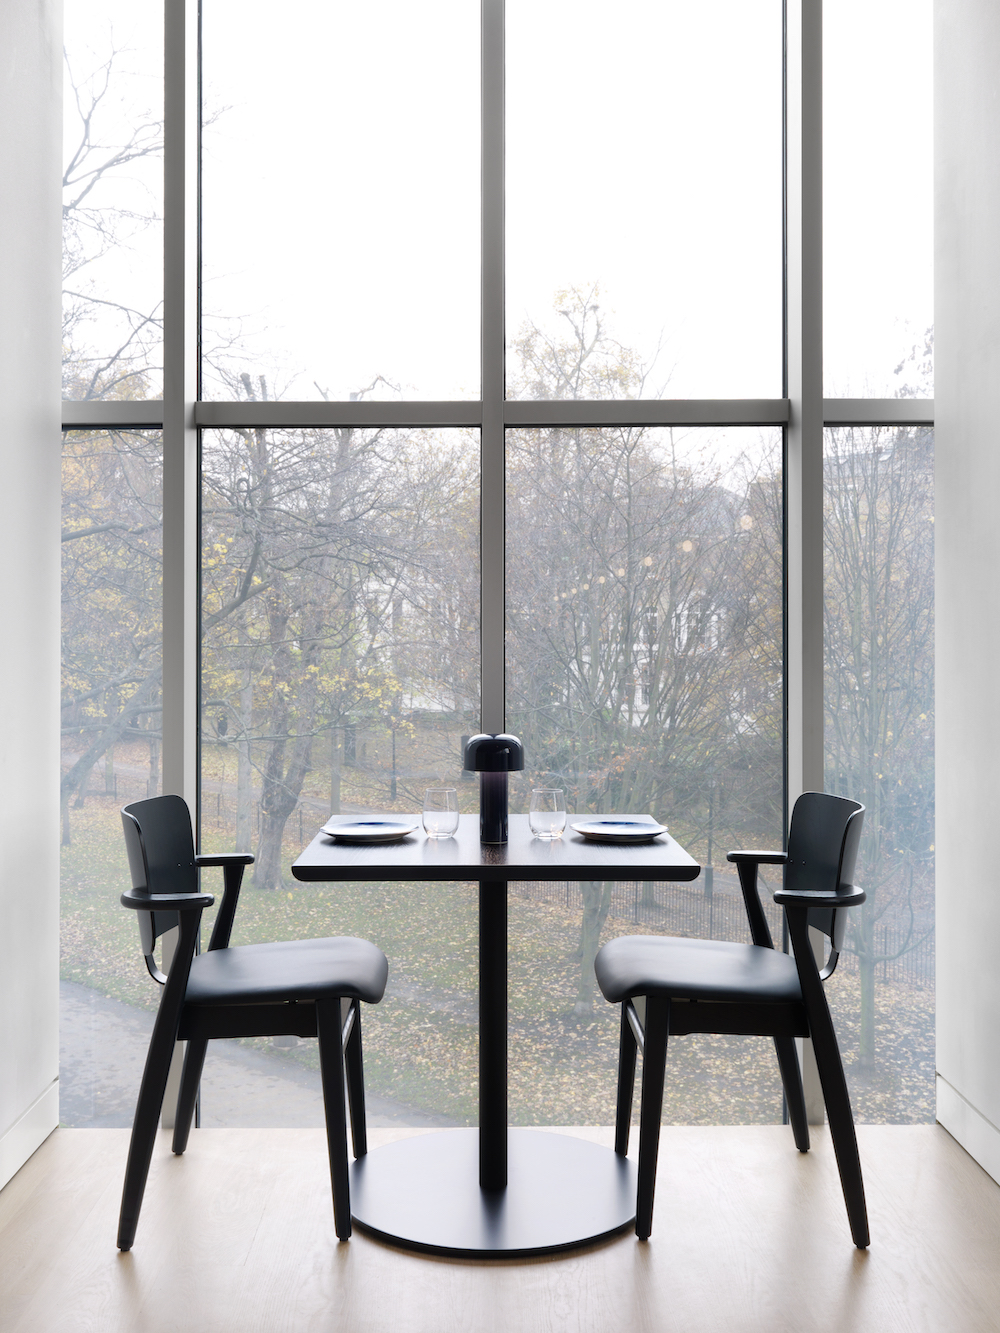 The new Design Museum restaurant, Parabola, designed by Universal Design Studio. Courtesy Charles Hosea